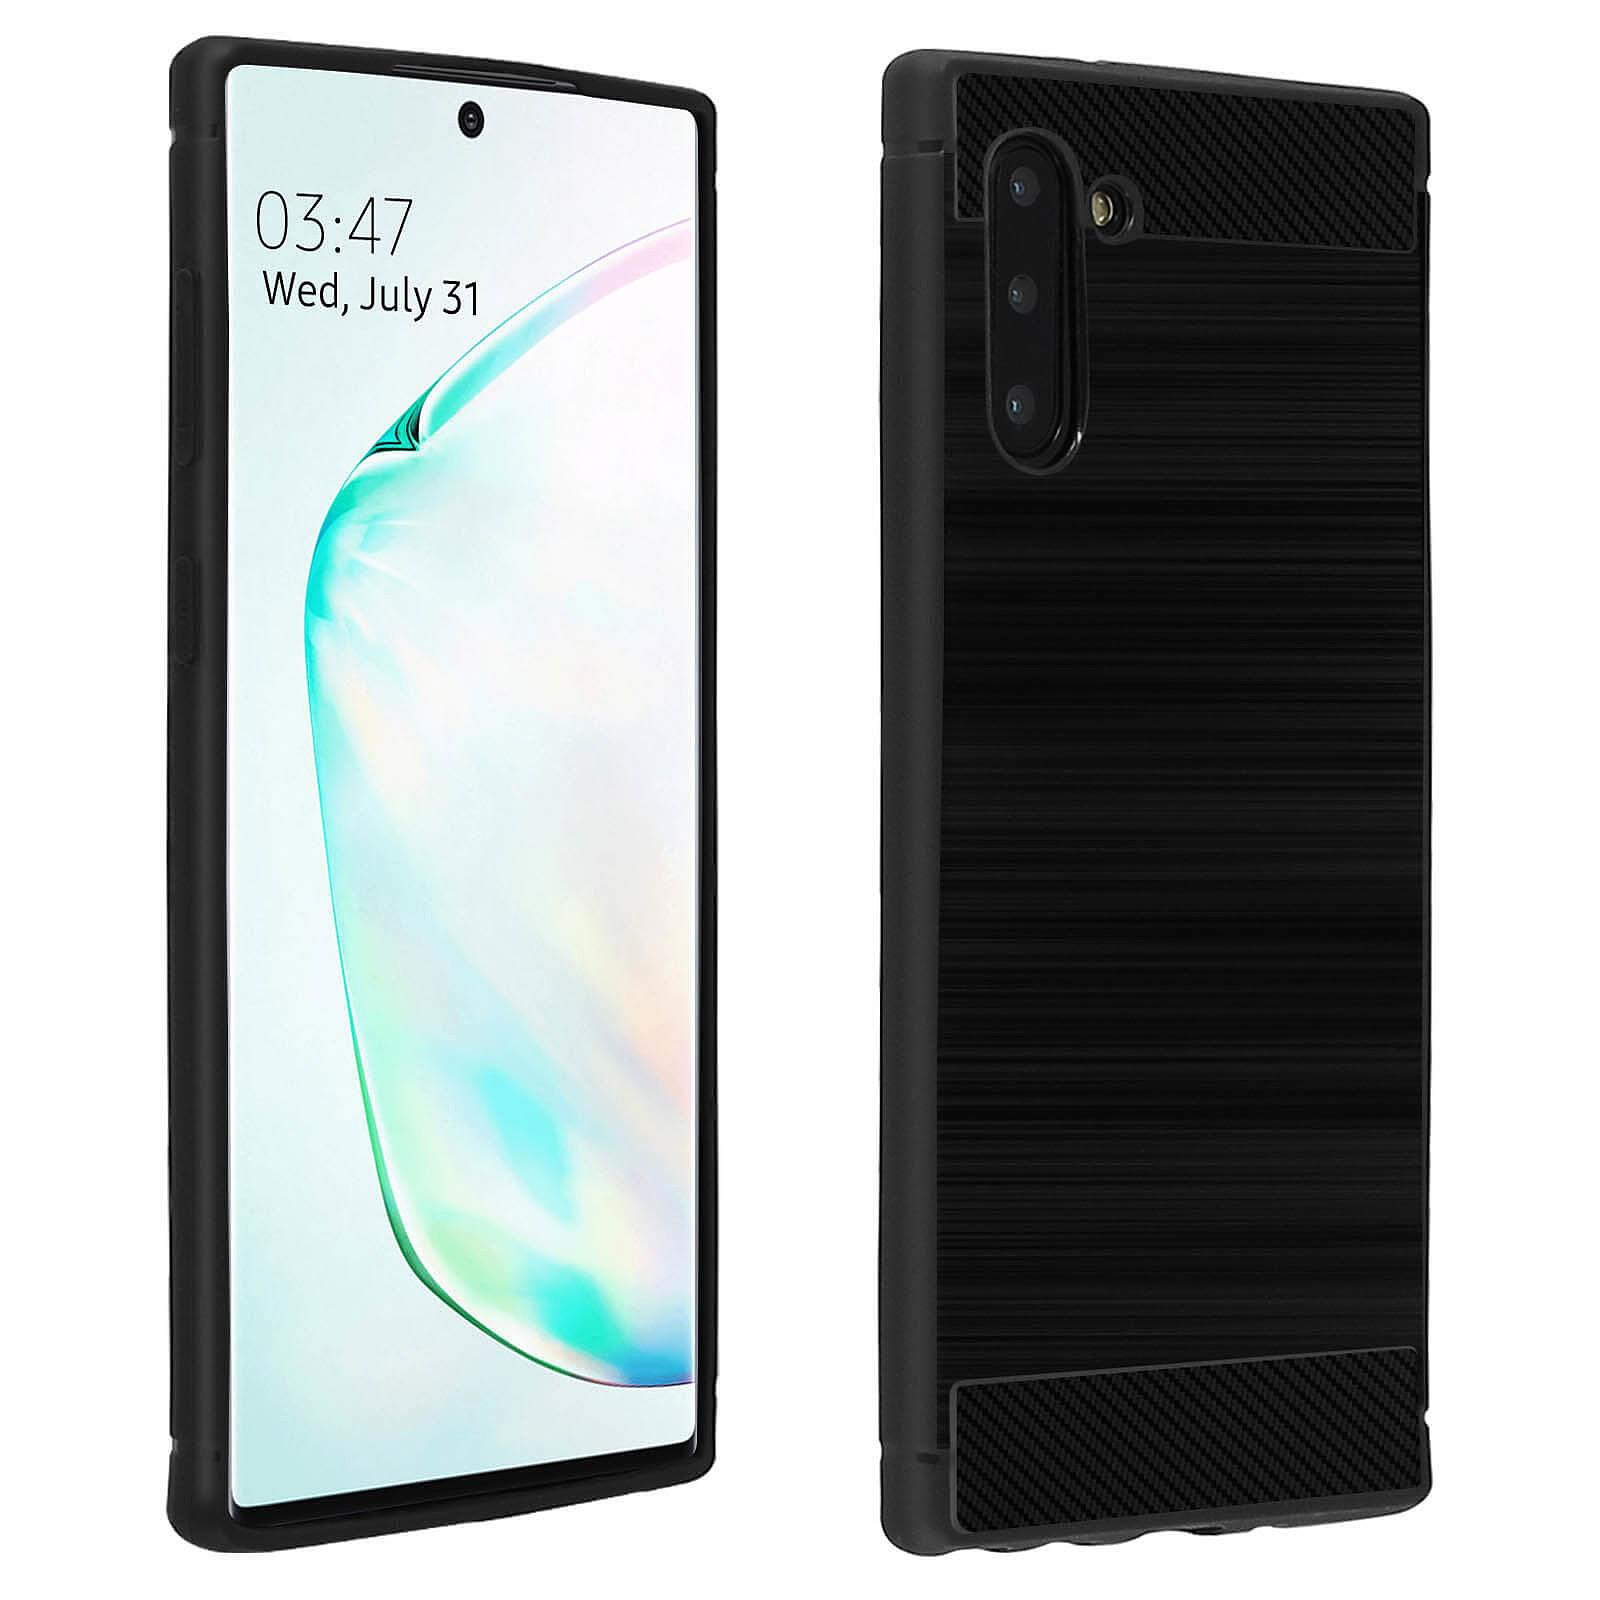 Avizar Coque Noir Carbone pour Samsung Galaxy Note 10